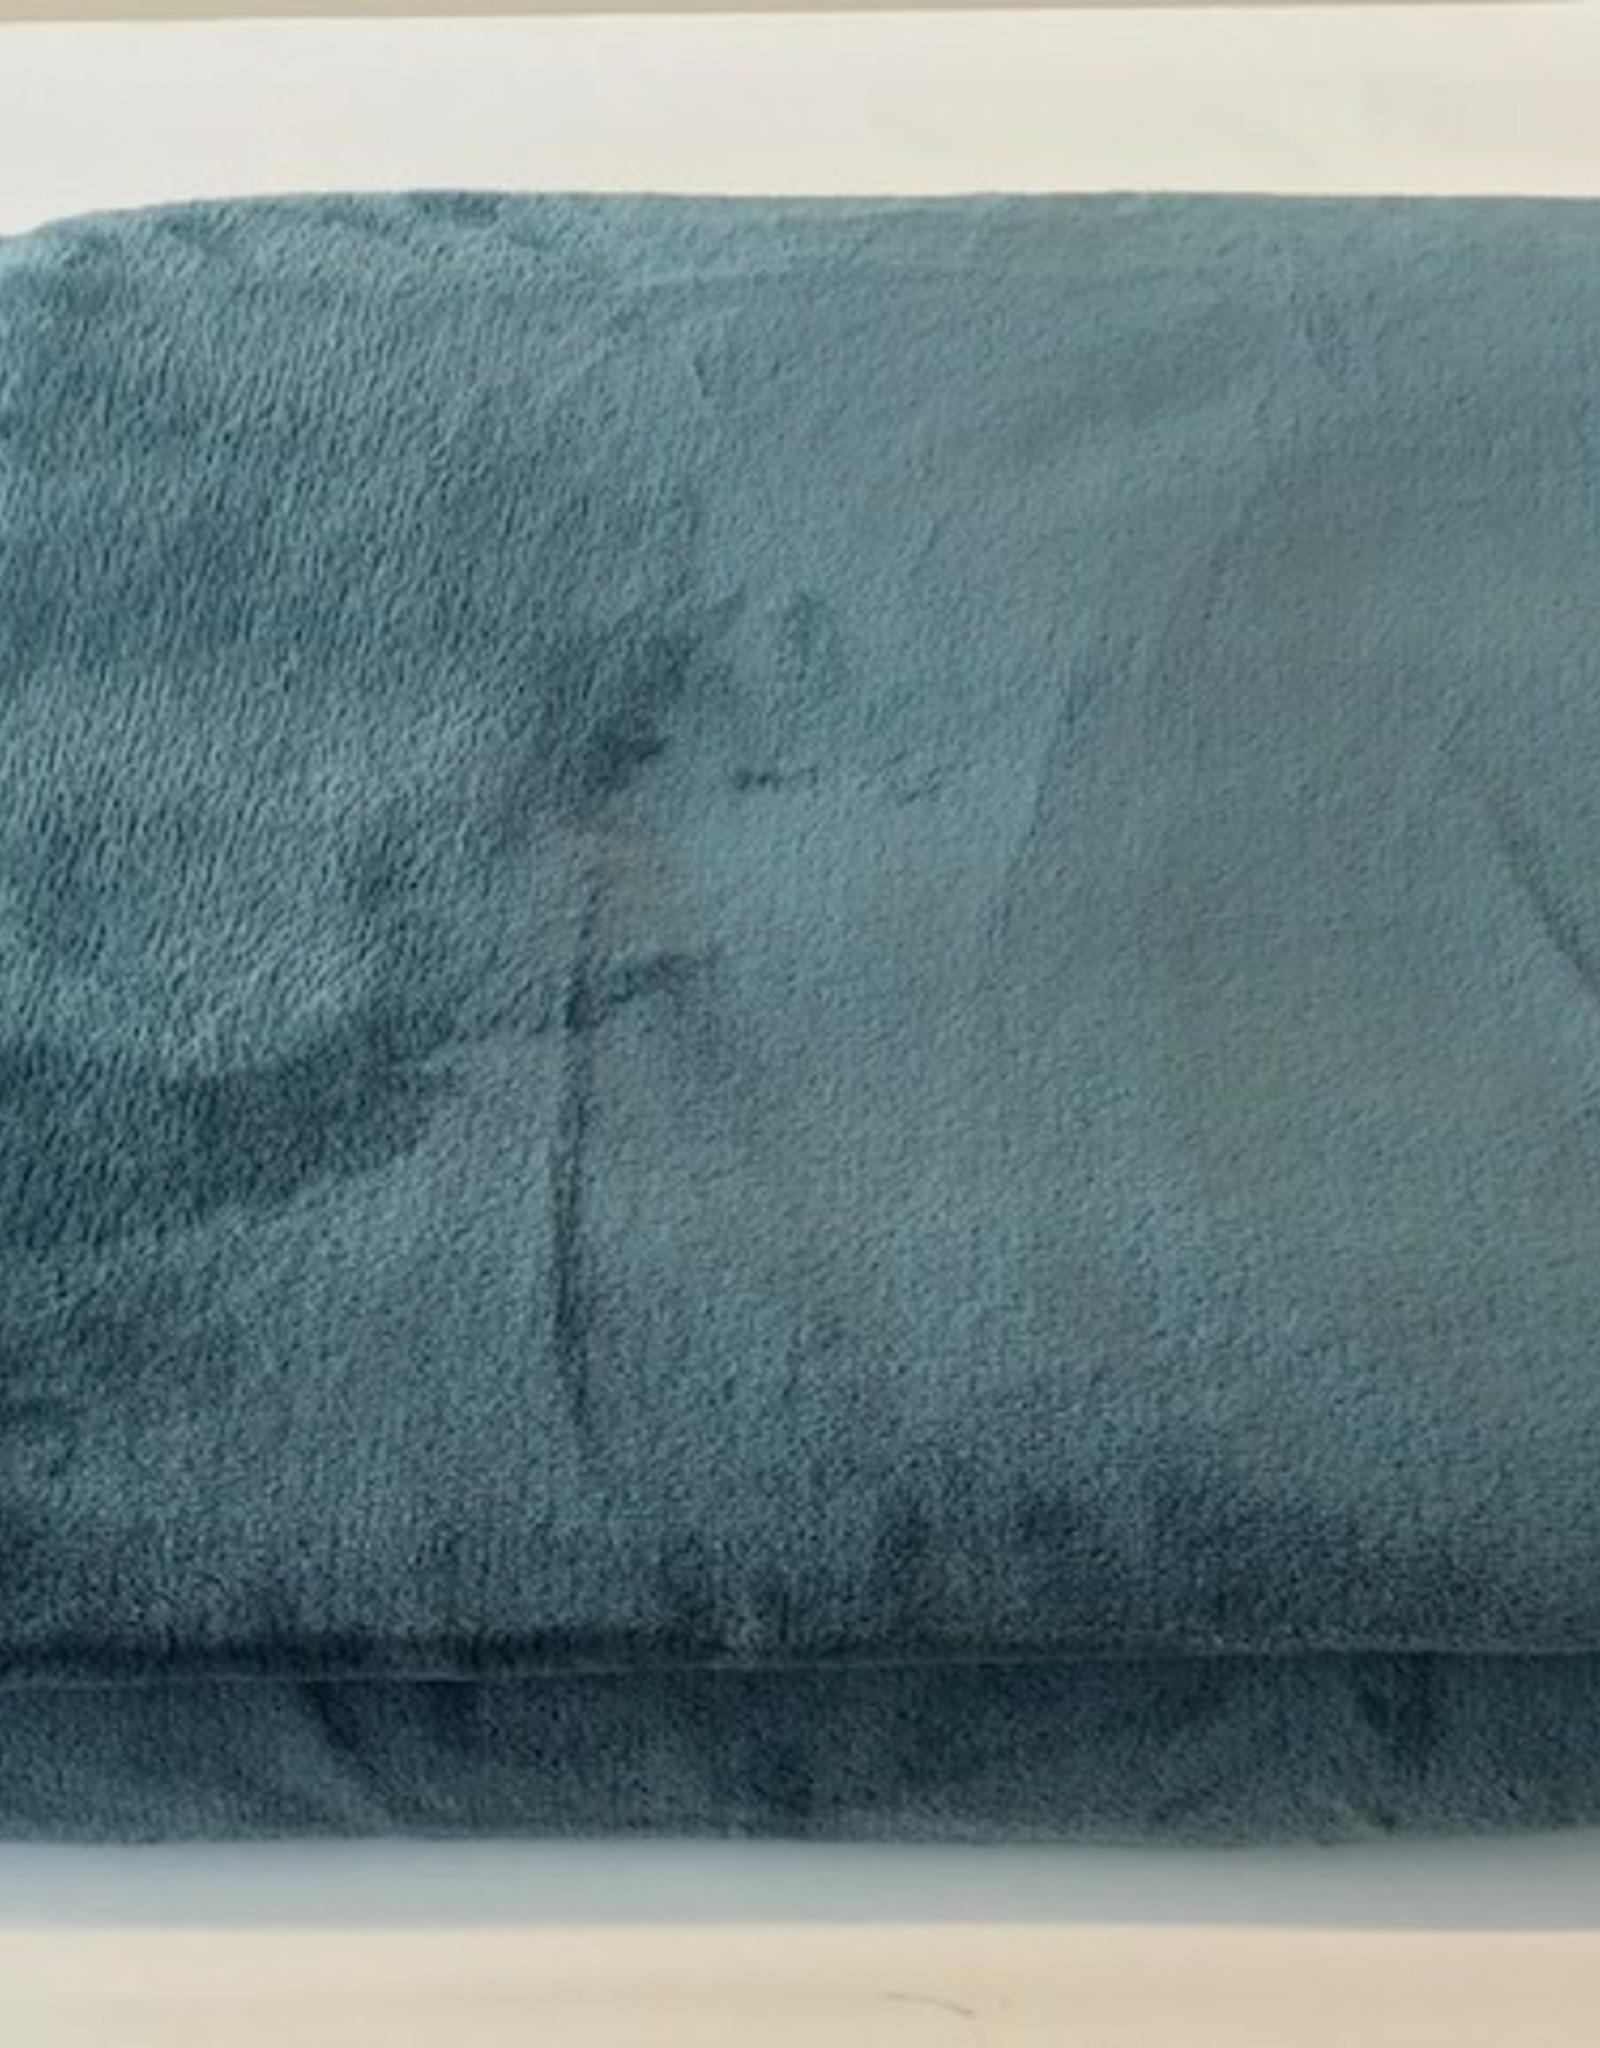 Sleepconsult Plaid Micro 150 x 200 cm ,  Poseidon